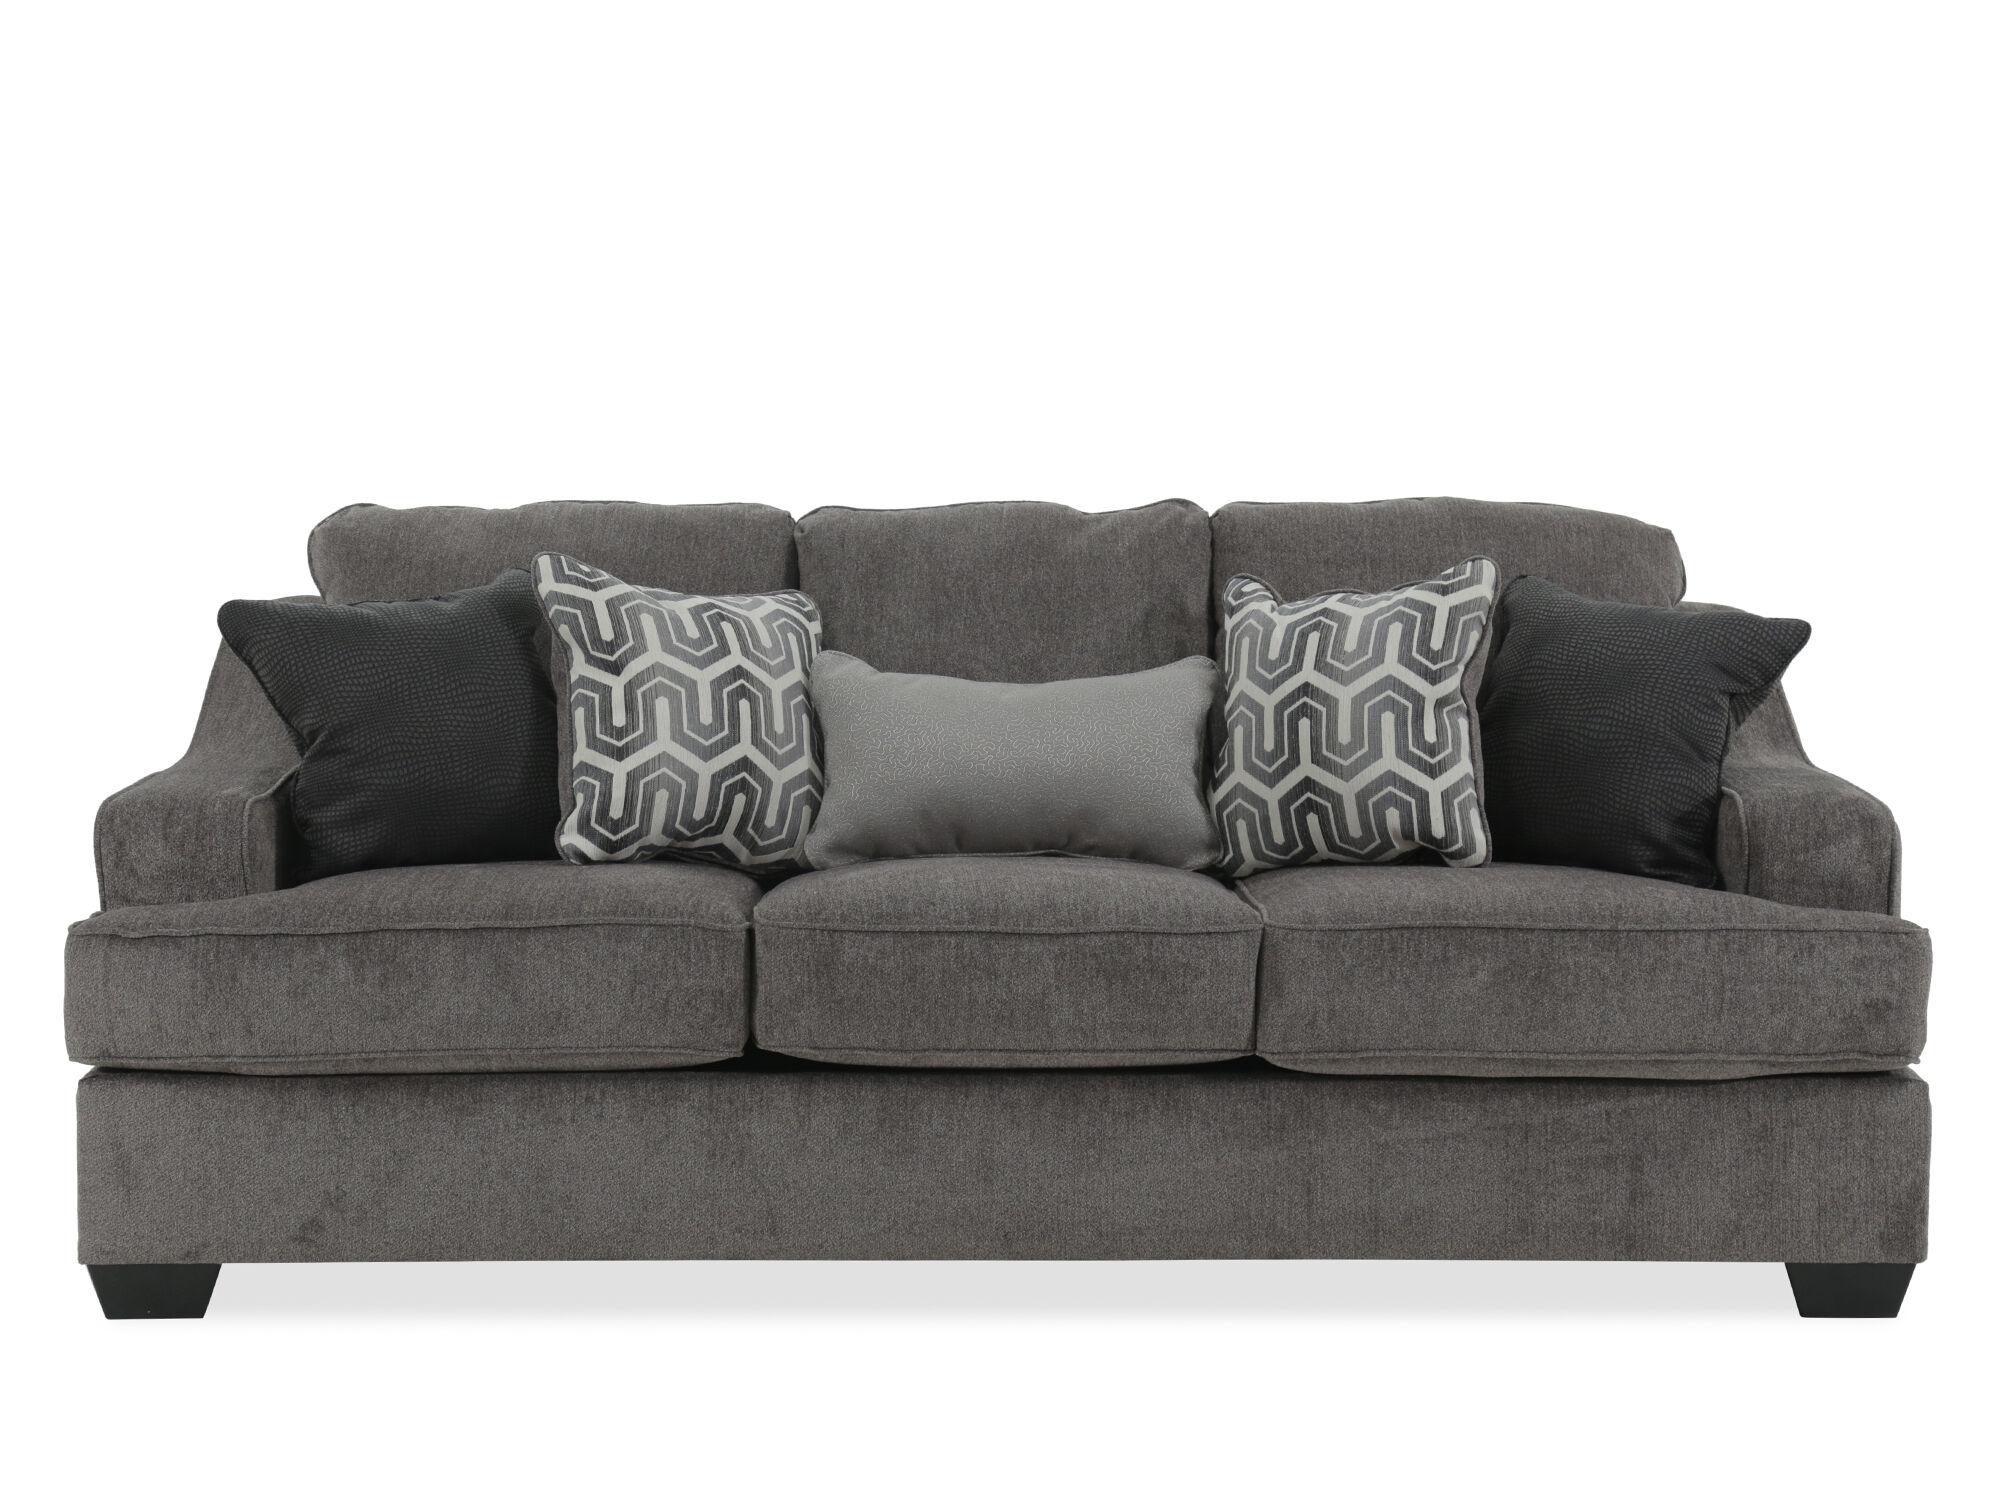 Merveilleux Contemporary 89u0026quot; Sofa In ...